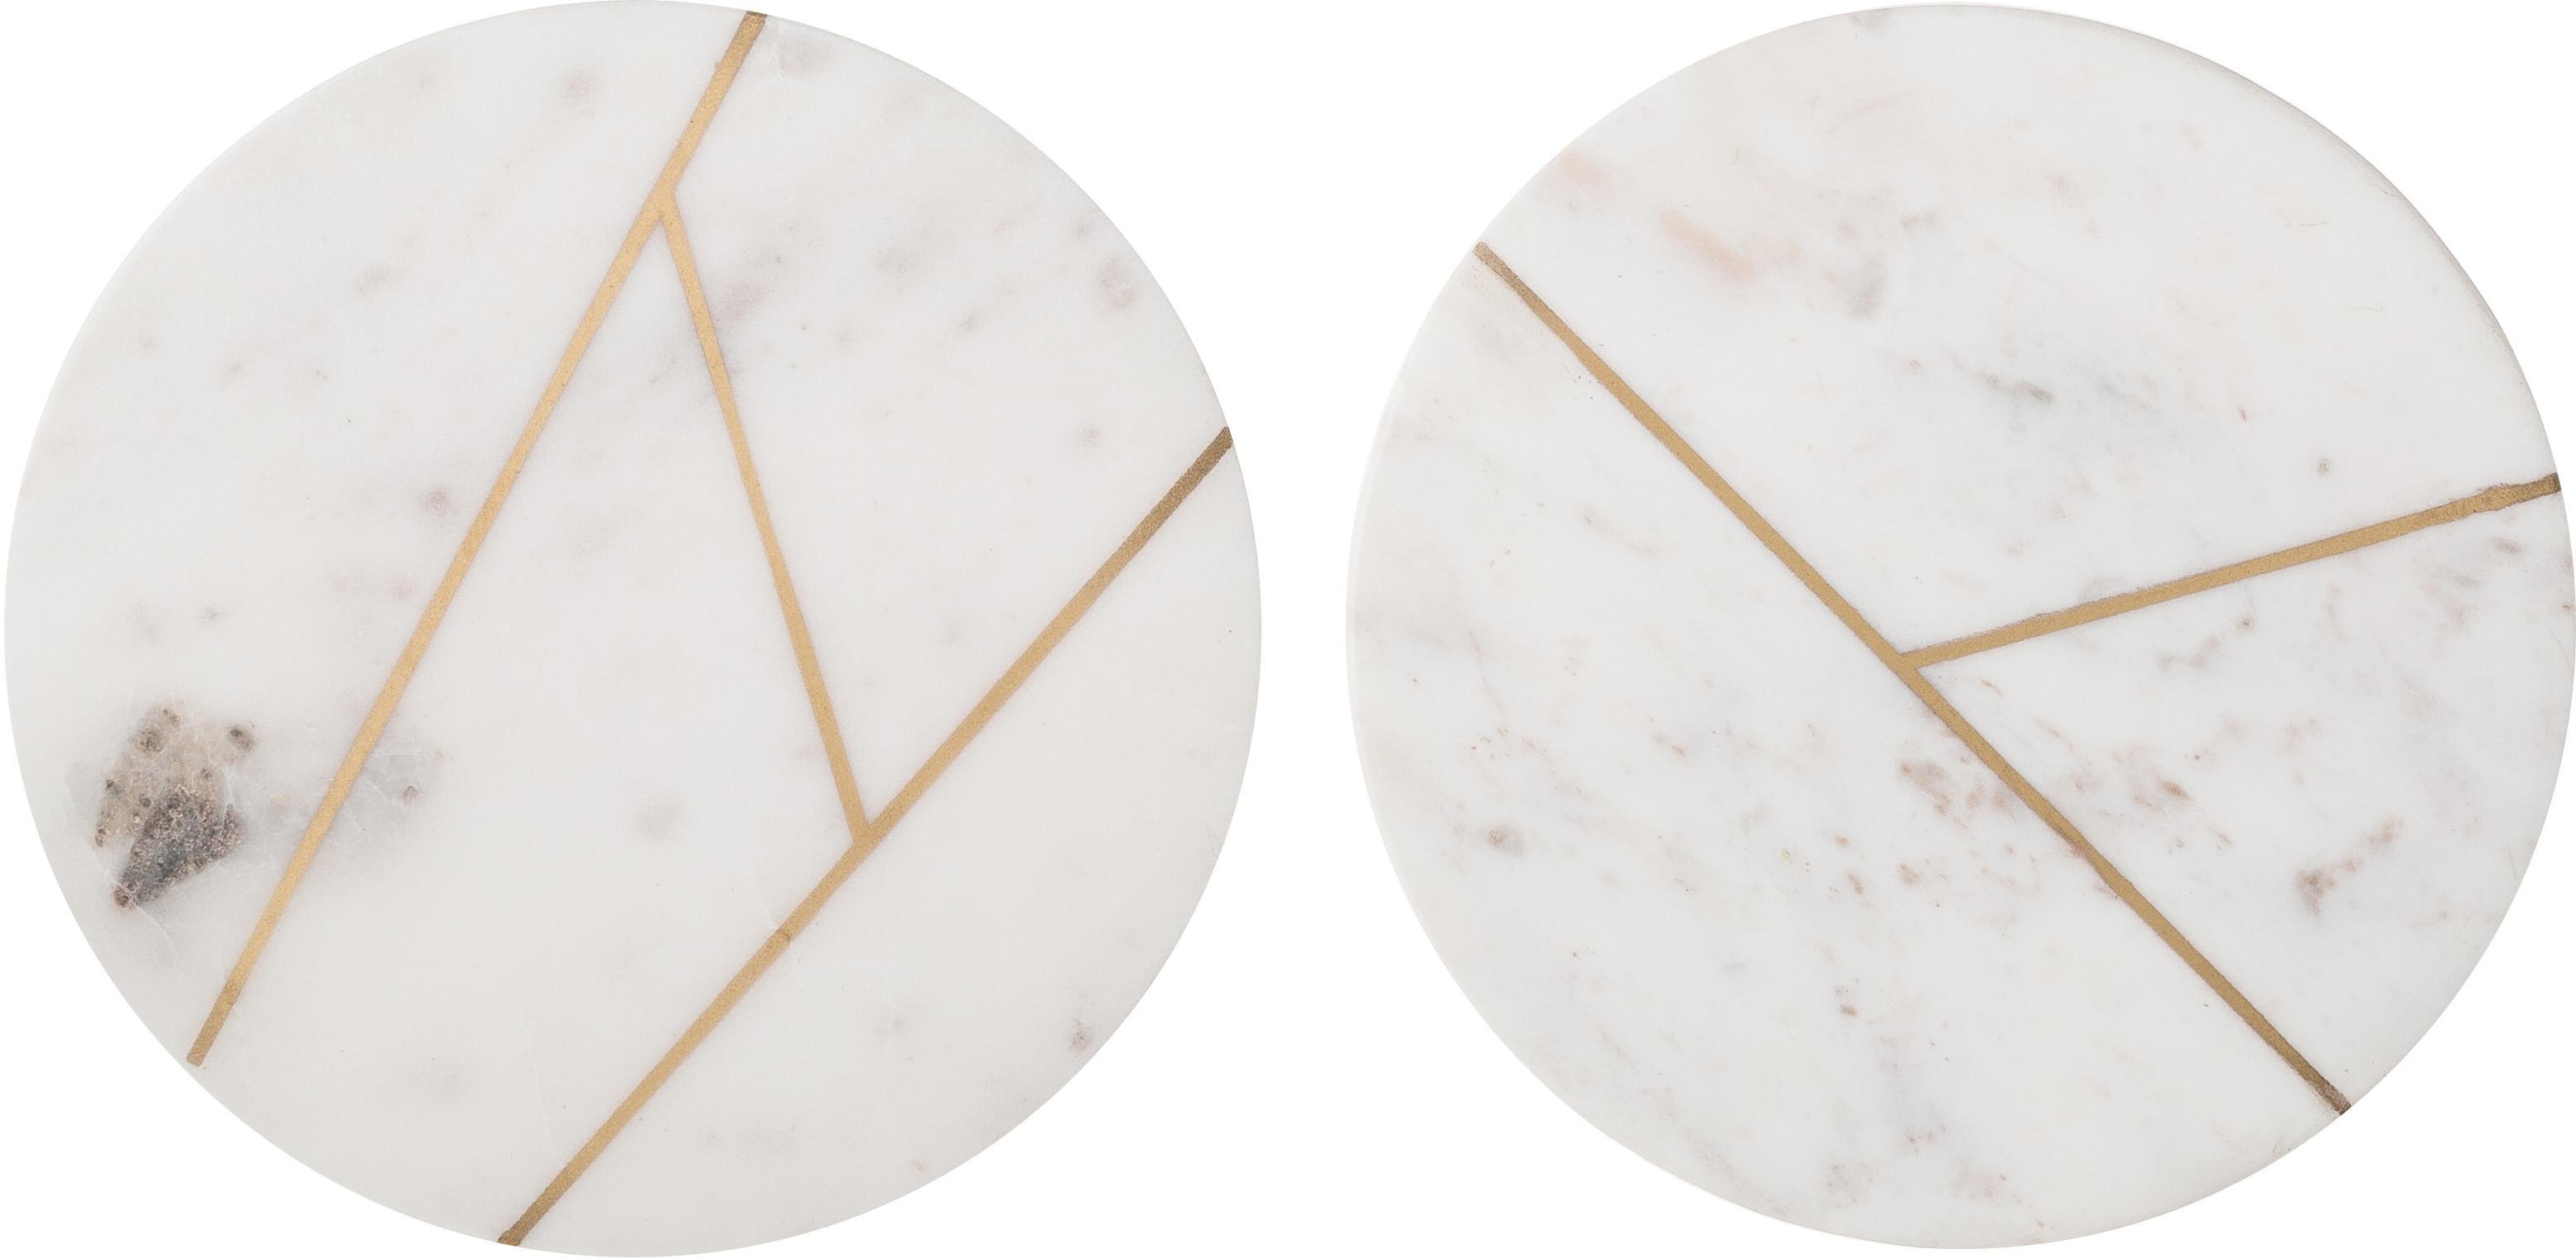 Set de placas de mármol Marble, 2pzas., 100%mármol, Blanco, dorado, Ø 18 cm